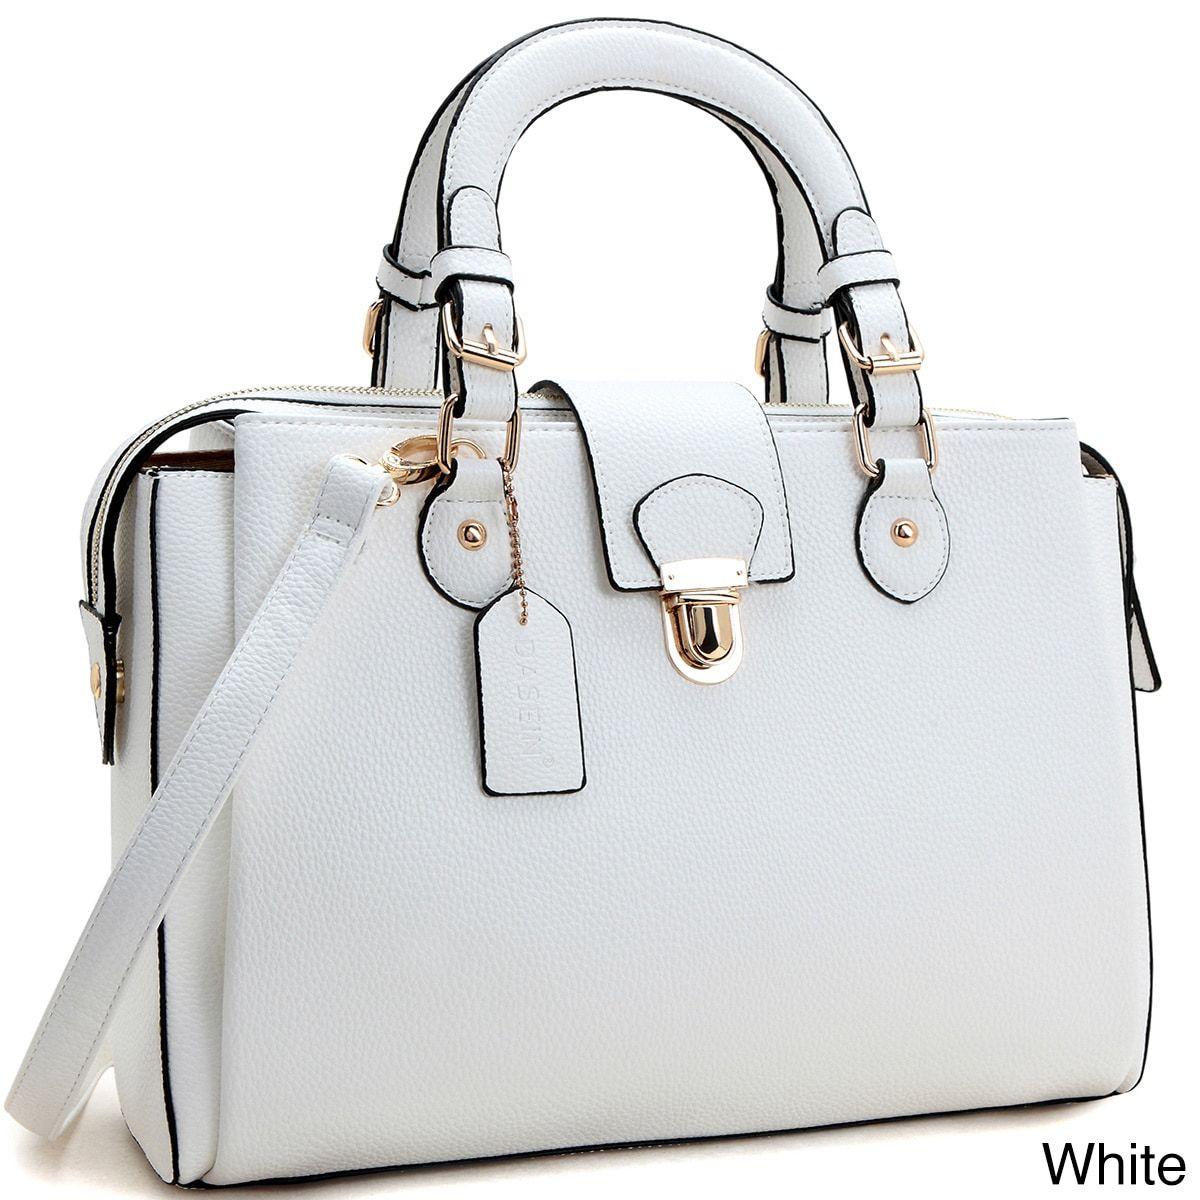 Dasein Front Snap Lock Satchel Crossbody Handbag Women S 4 Inch Handle Drop Length 42 Shoulder Strap Measures 14 Inches Wide X 10 High